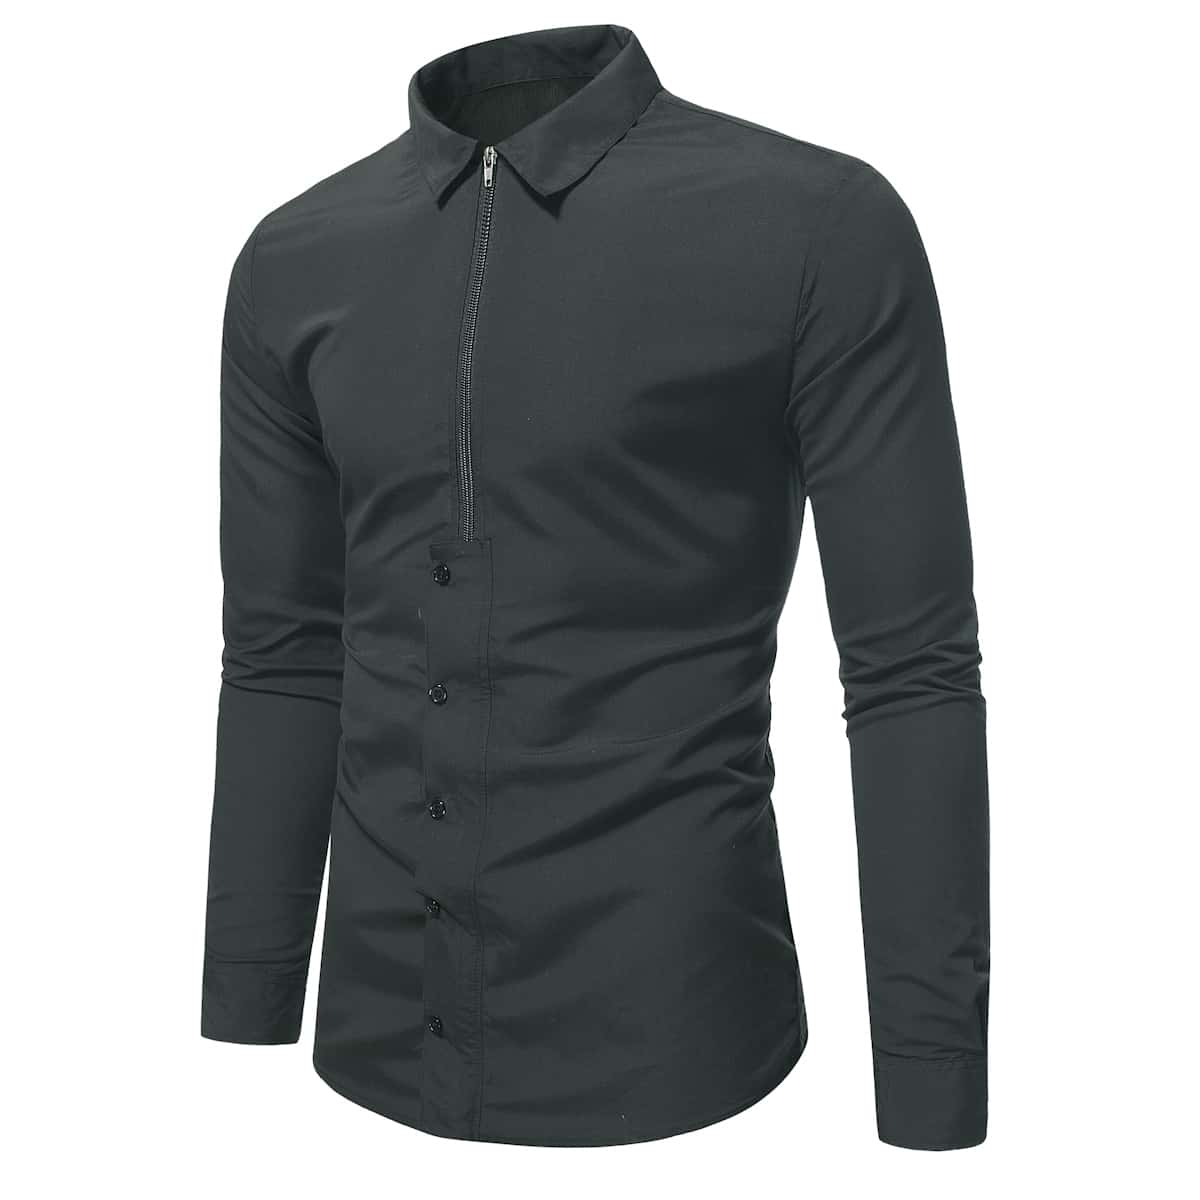 Мужской Рубашка с молнией & на пуговицах